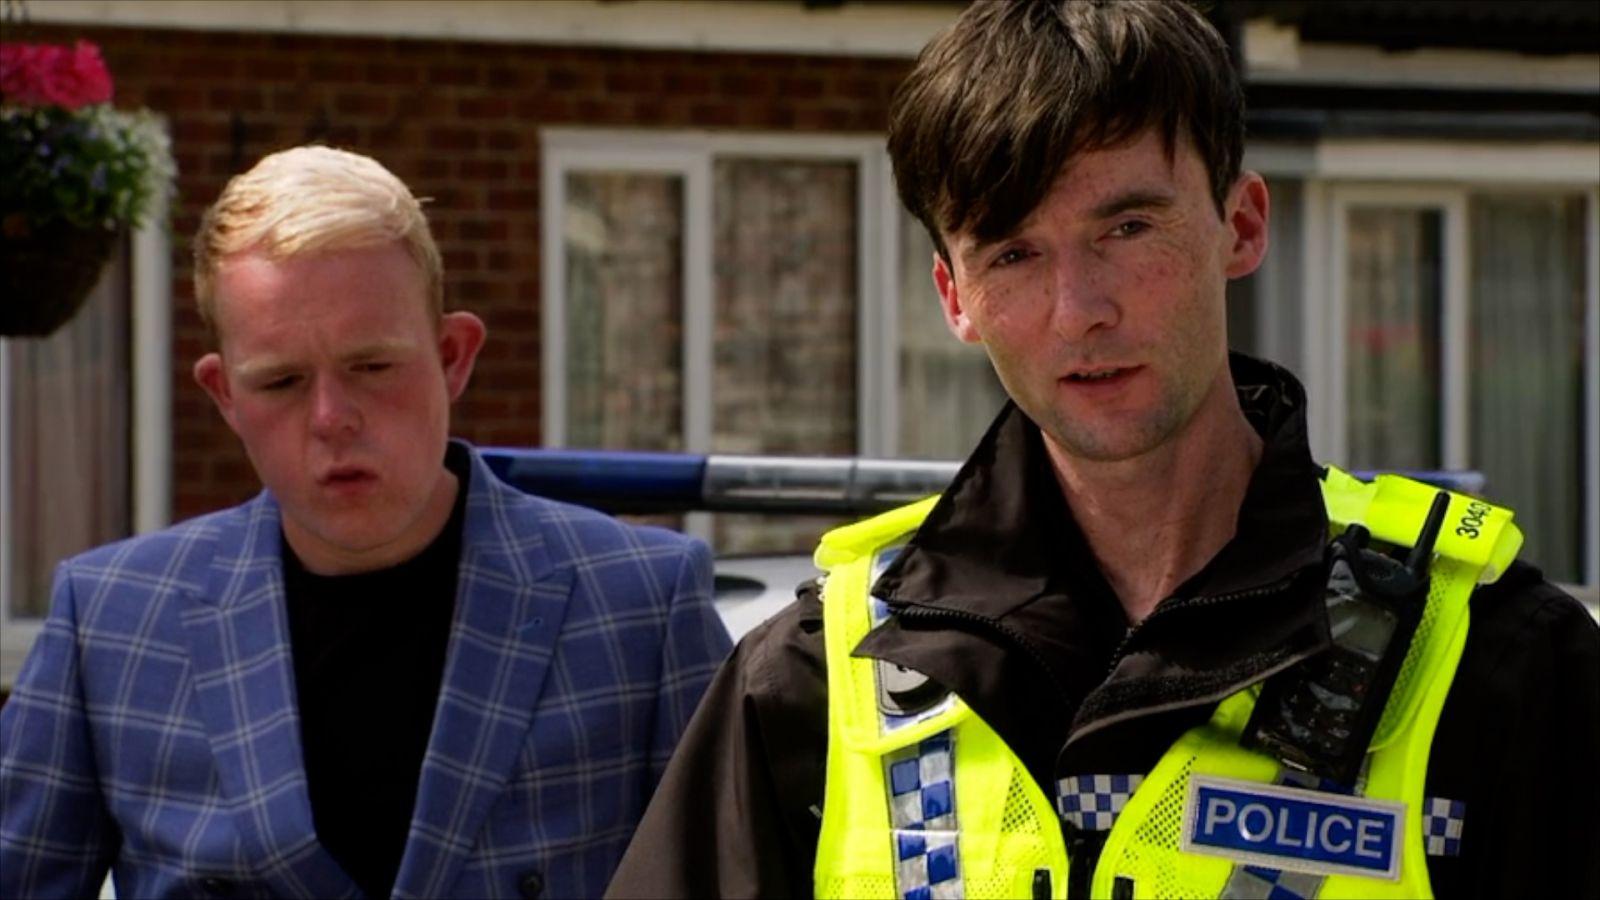 CORONATION STREET (ITV) - PC Clements